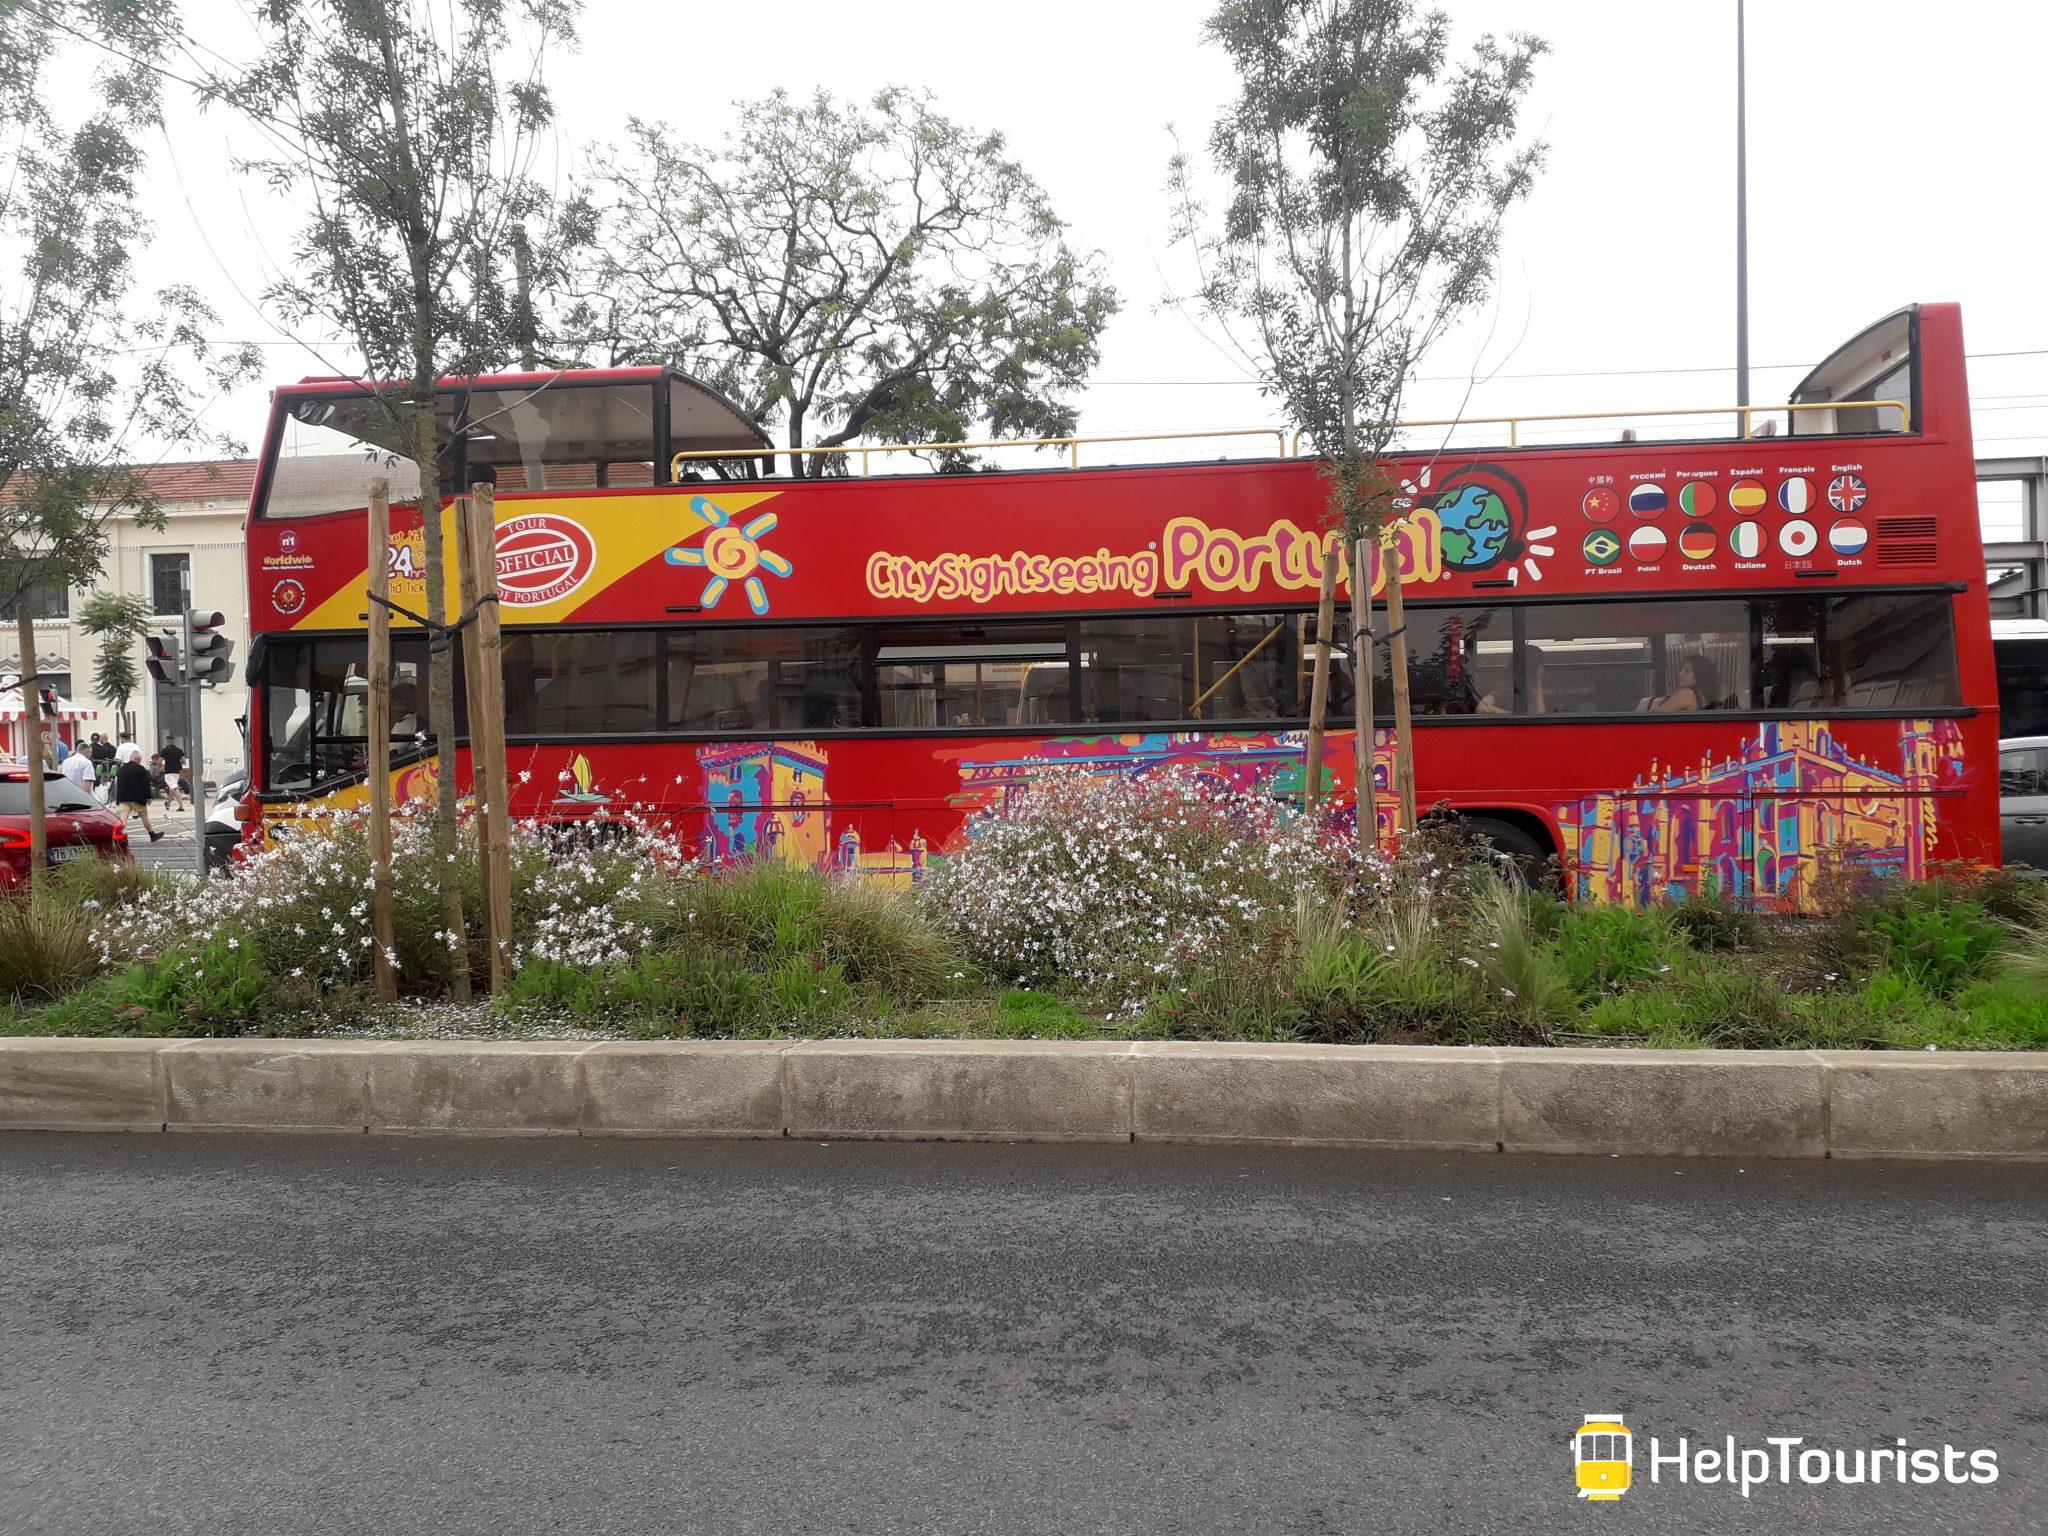 Lissabon bus hop on hop off